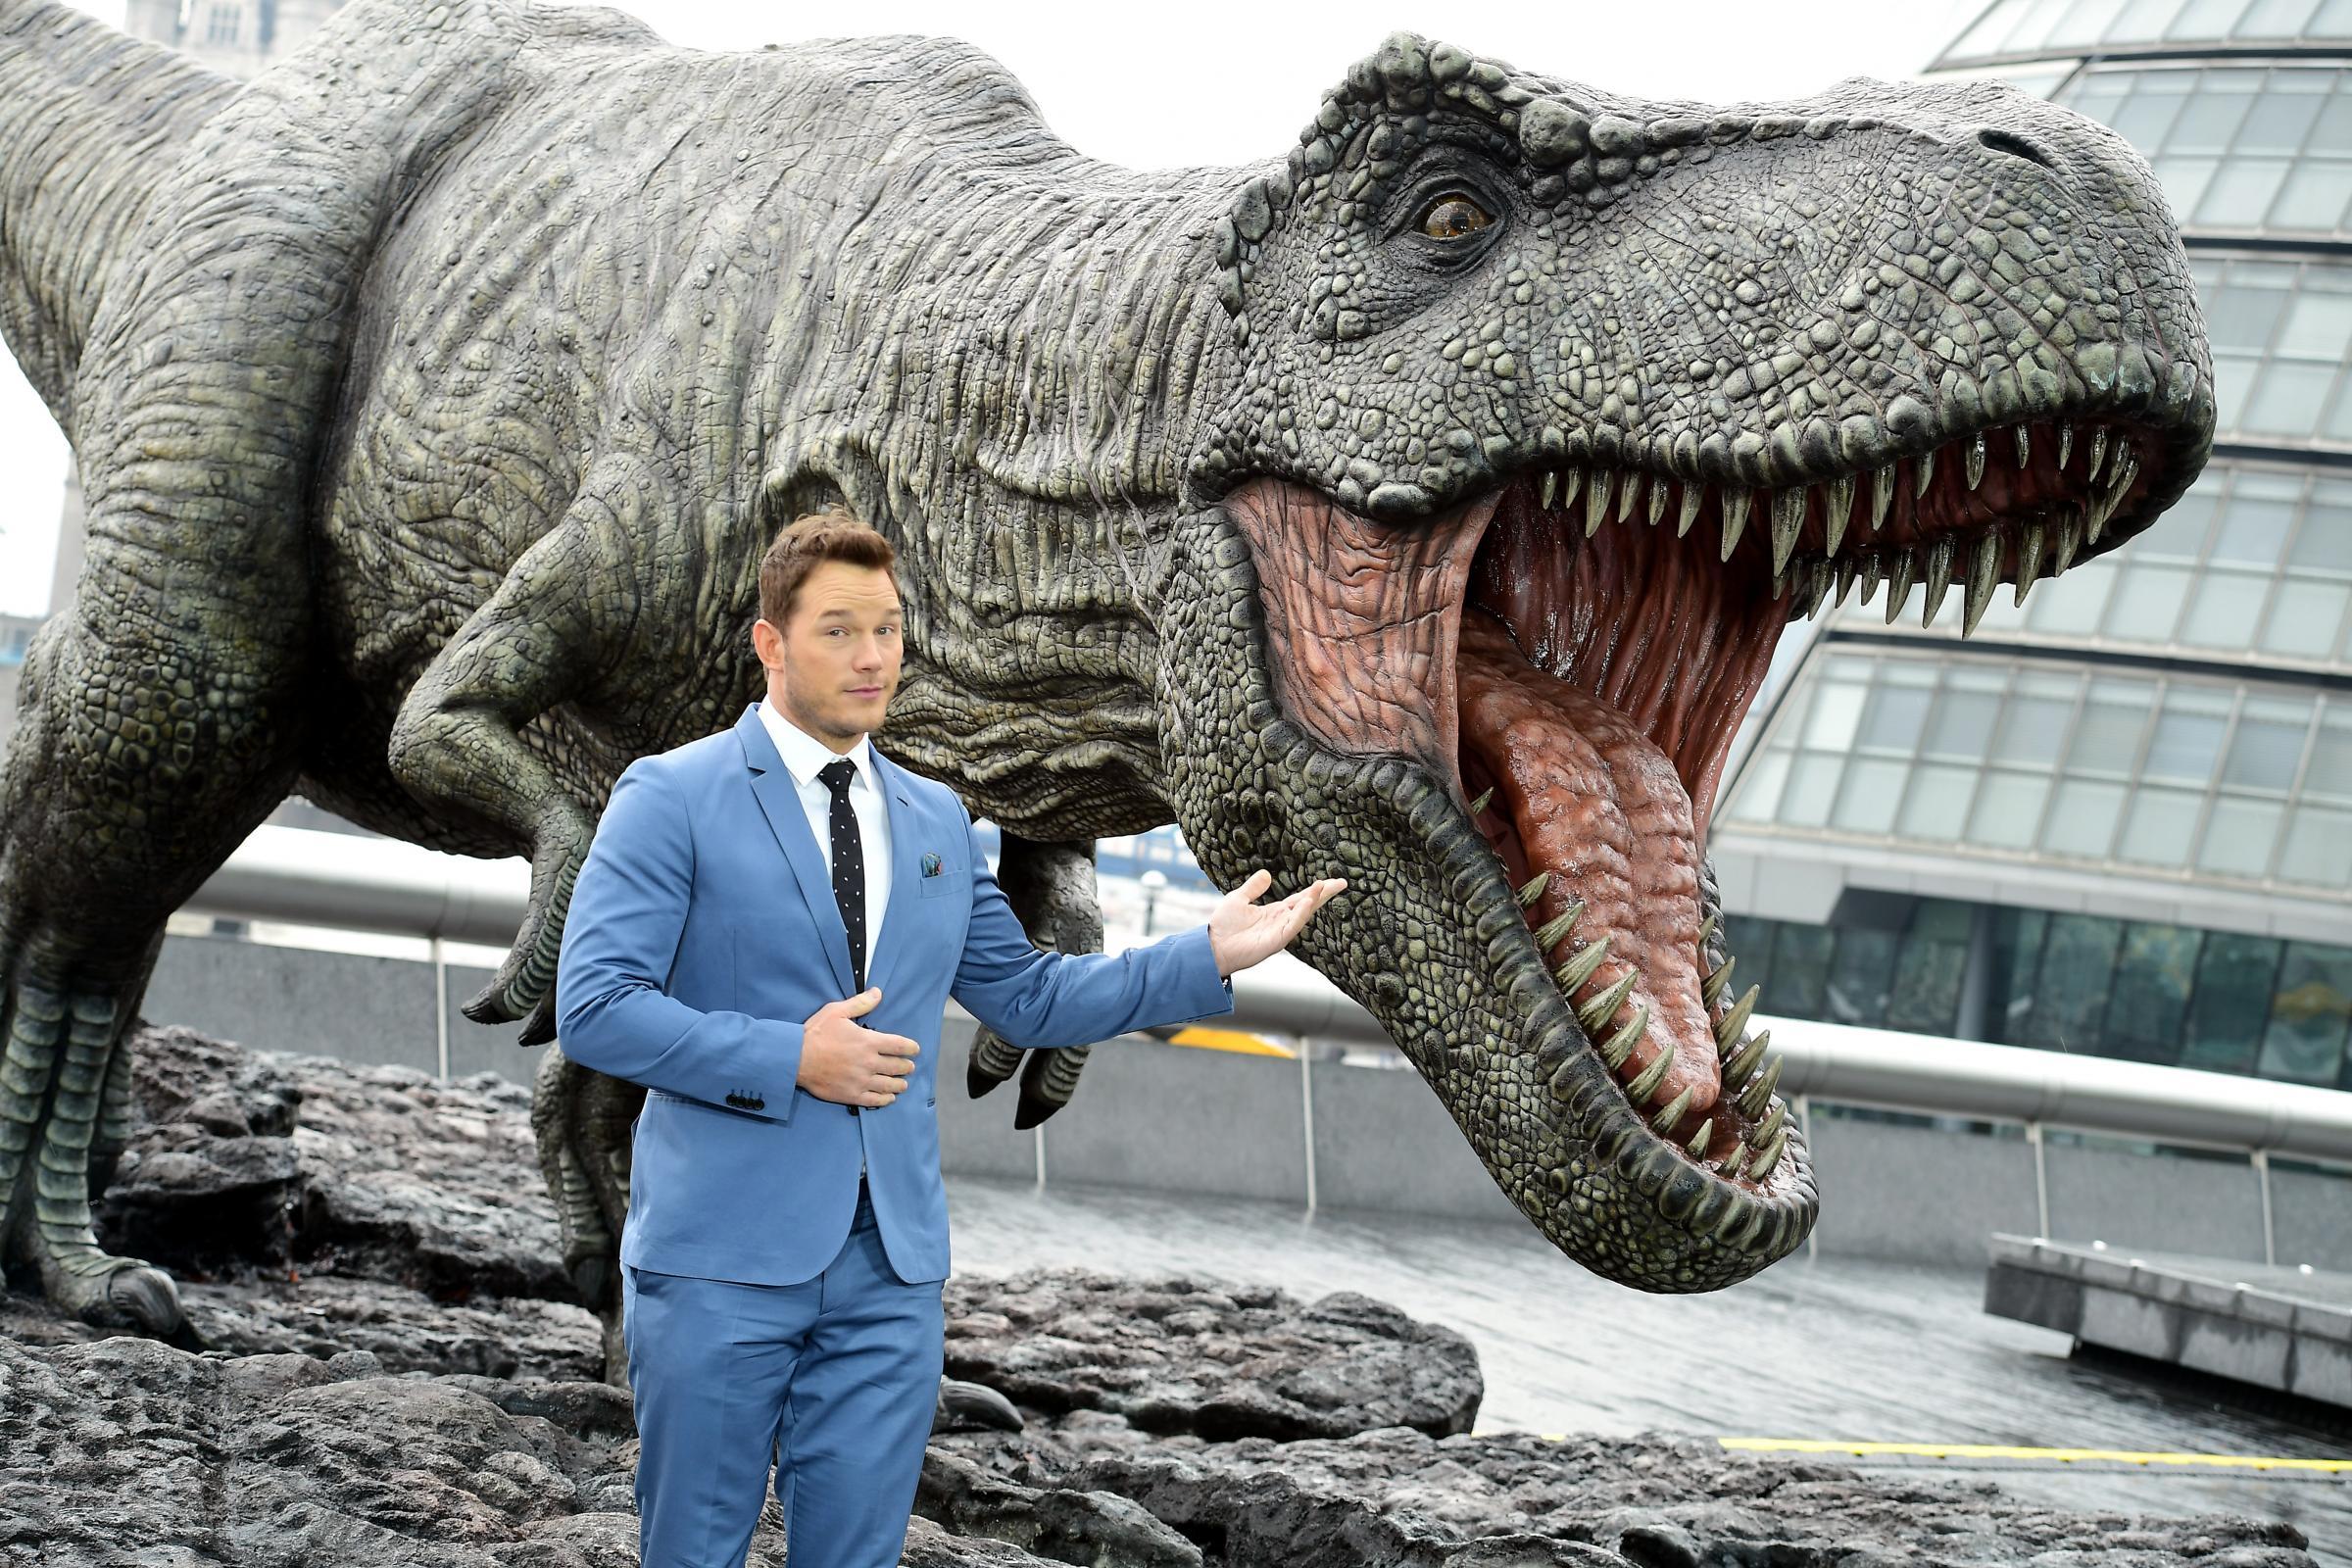 Jurassic World: Fallen Kingdom tops film download chart for second week